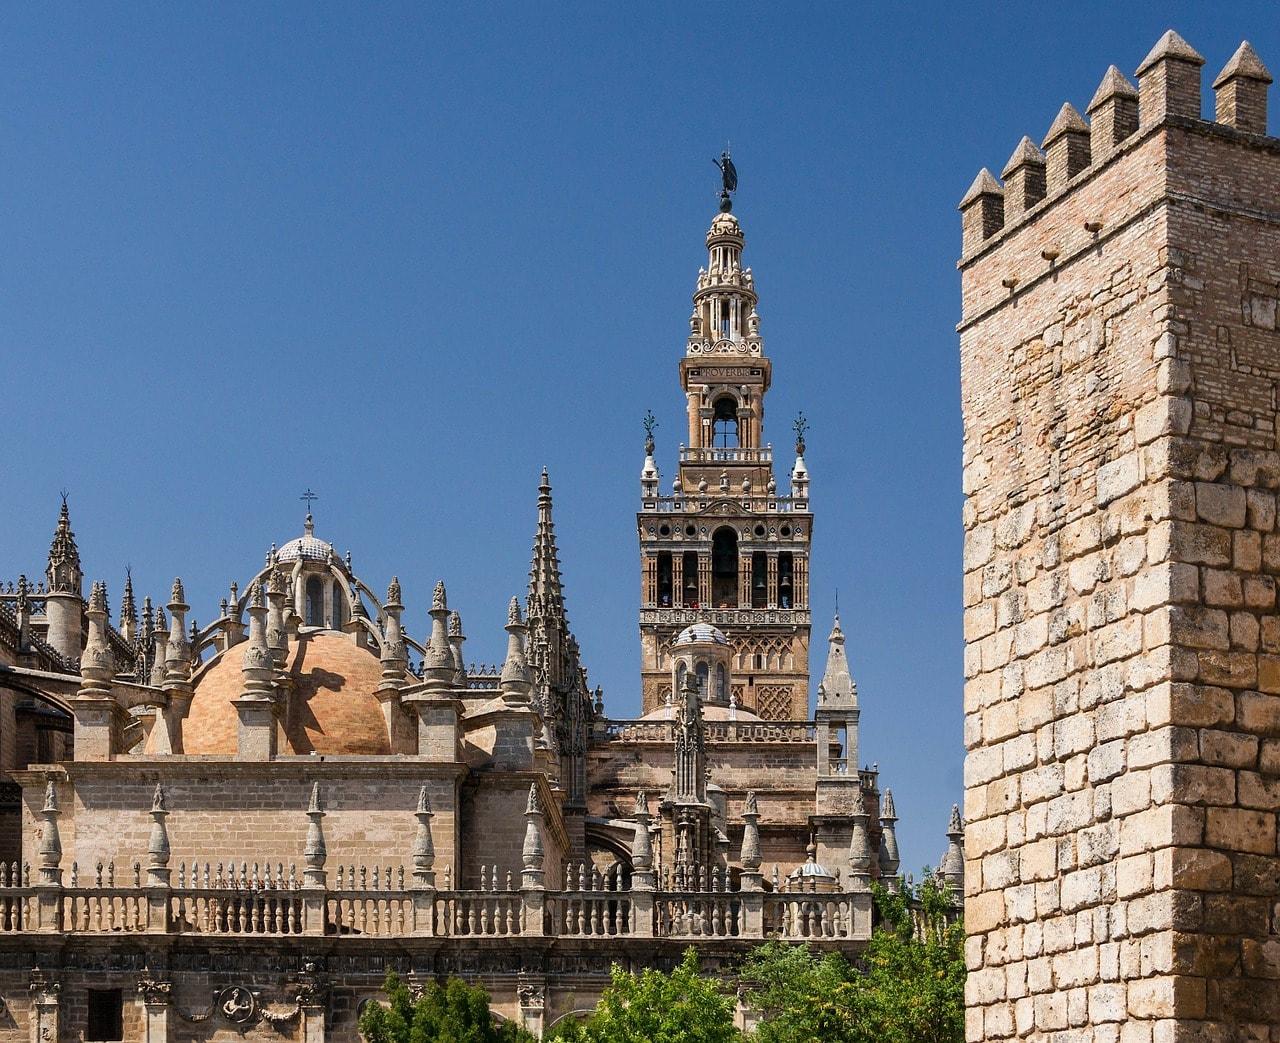 https://pixabay.com/en/seville-spain-real-alcazar-95310/